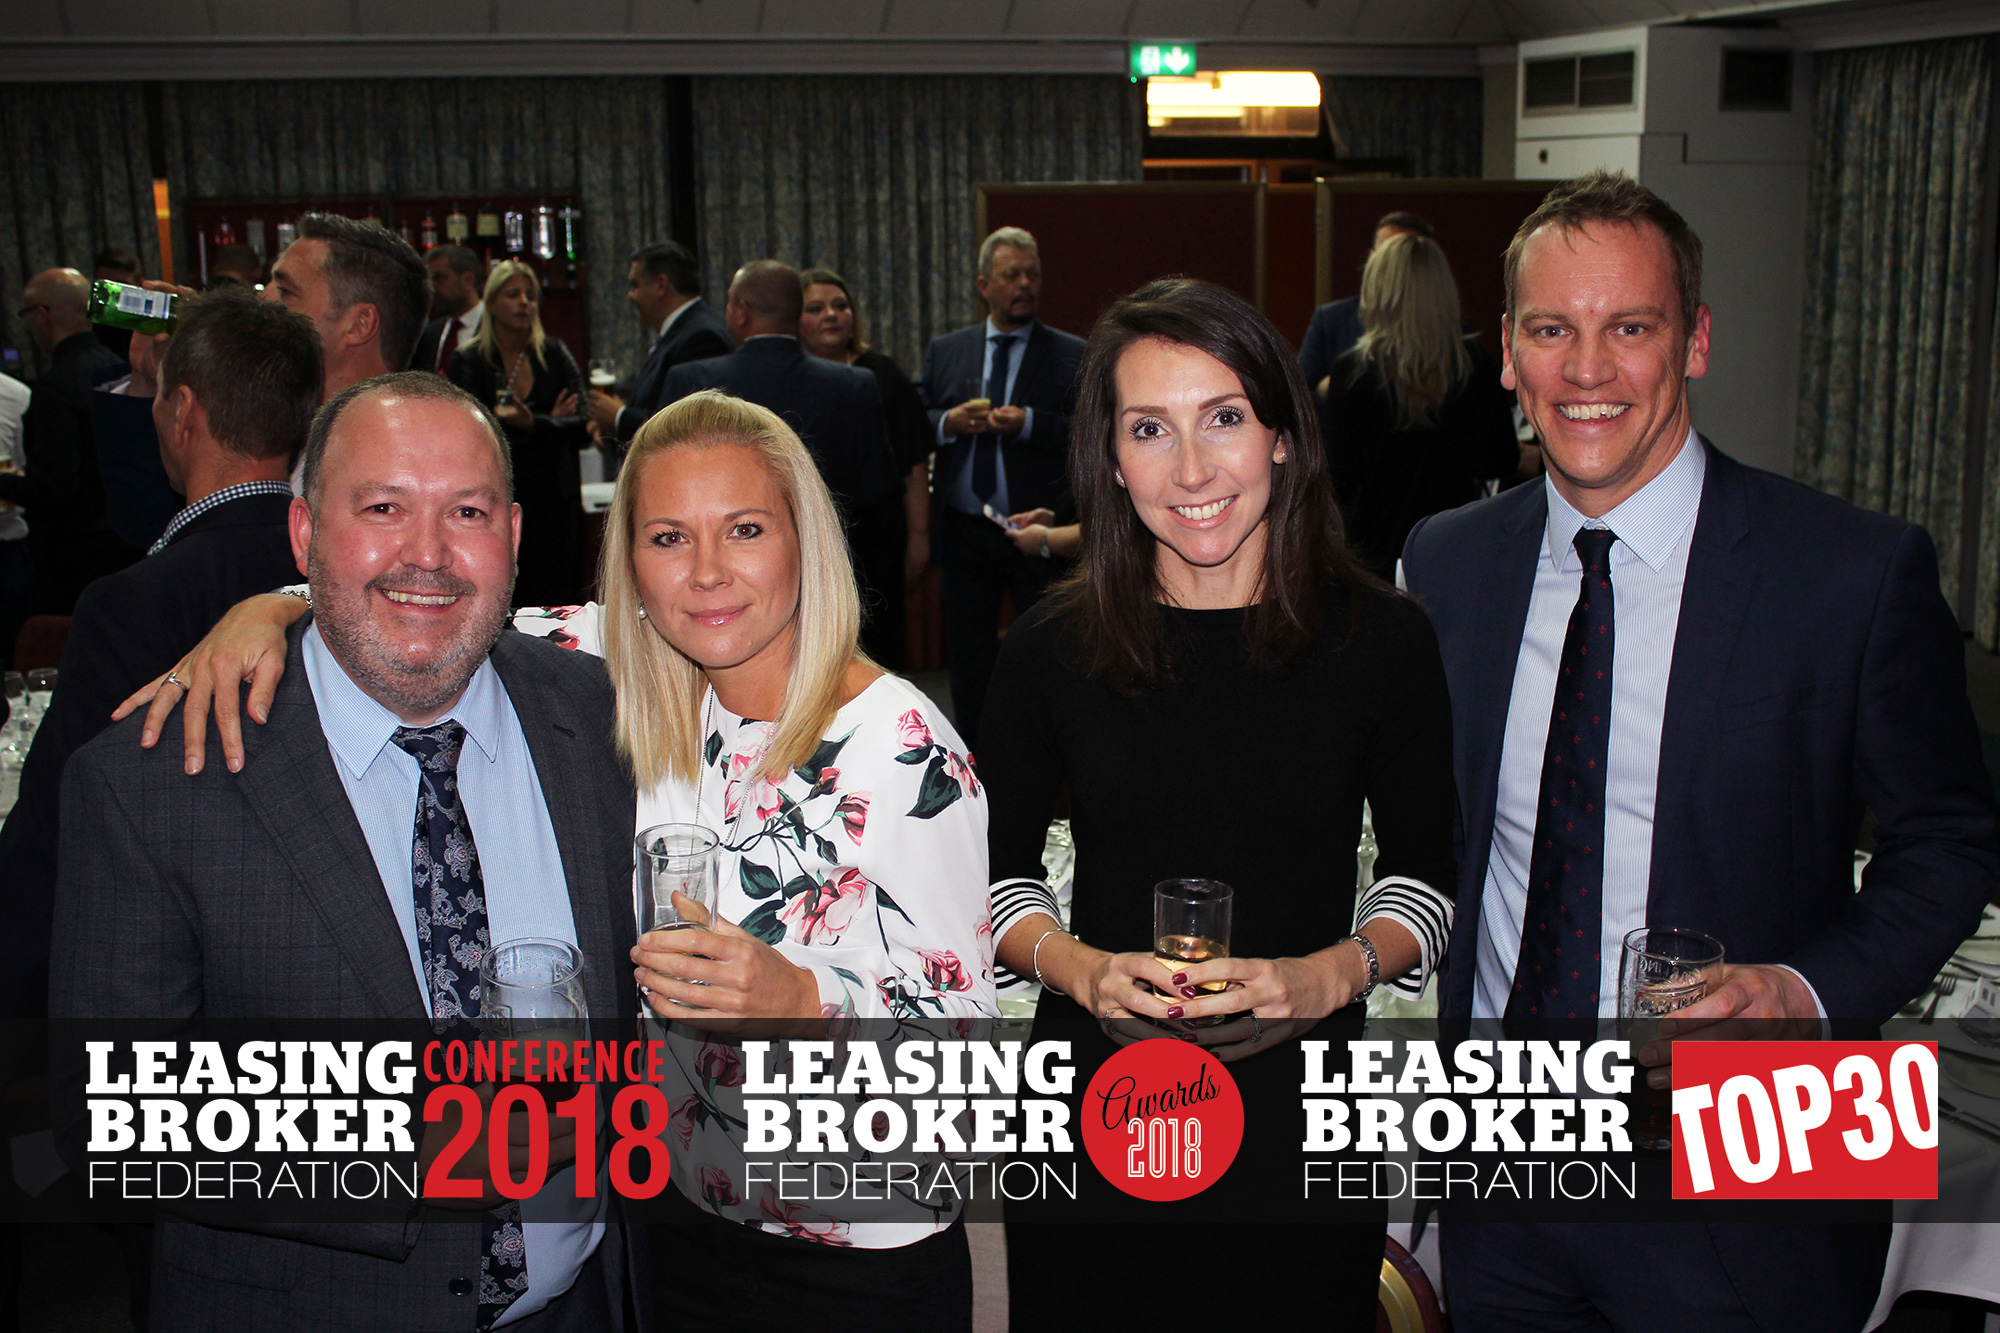 Leasing broker awards 2018